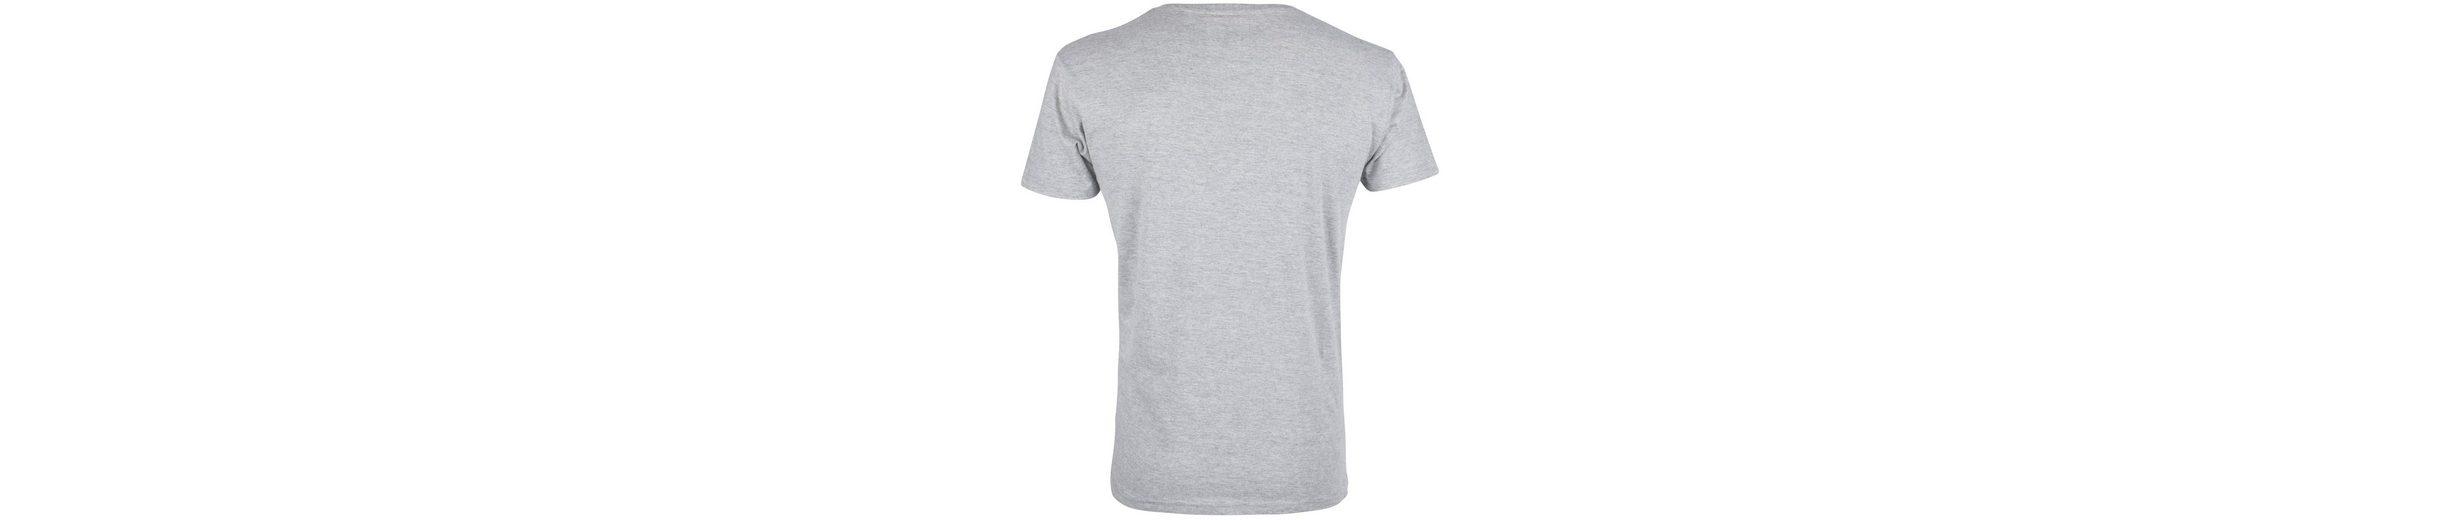 Billig Verkauf Genießen SOULSTAR T-Shirt Billig Original Verkauf In Mode a2P2h